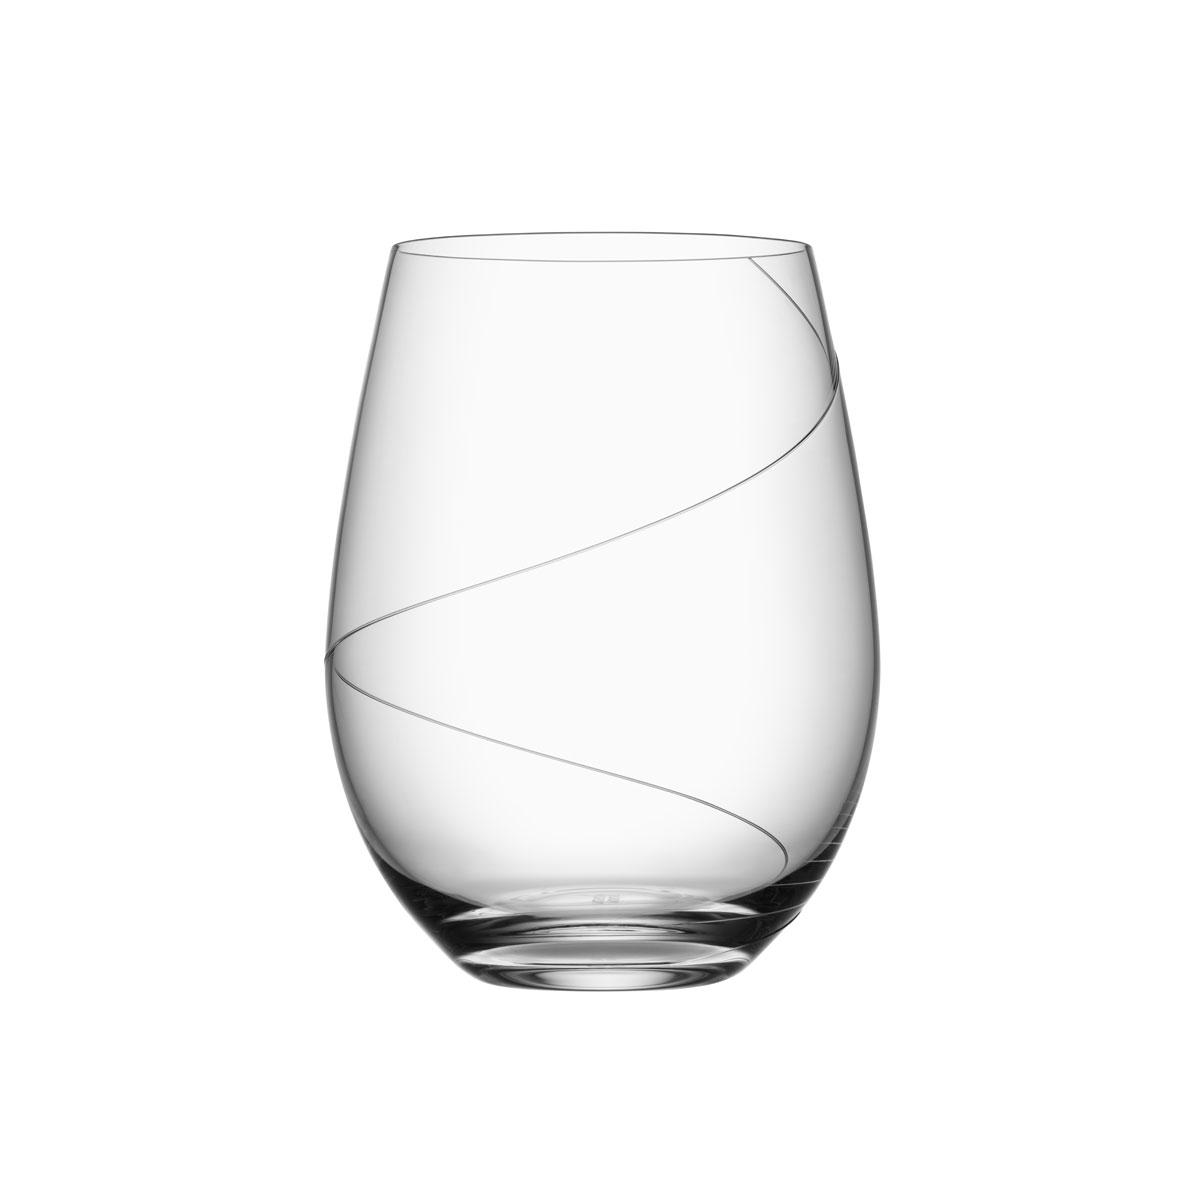 Kosta Boda Line Gin and Tonic Glass, Single